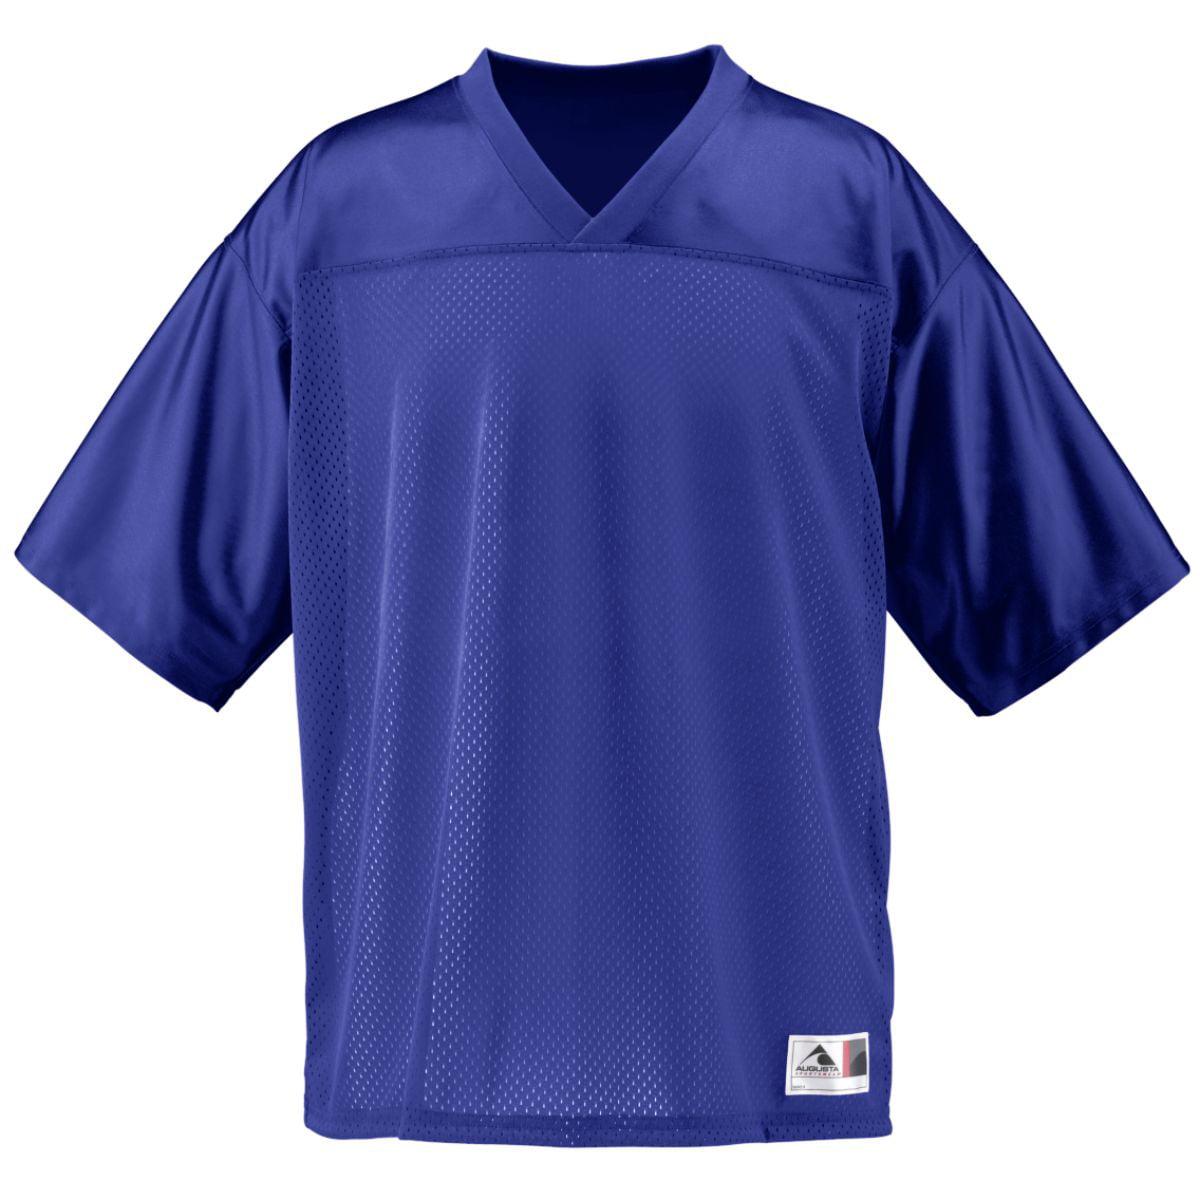 Augusta Stadium Replica Jersey Purple Xs - image 1 de 1